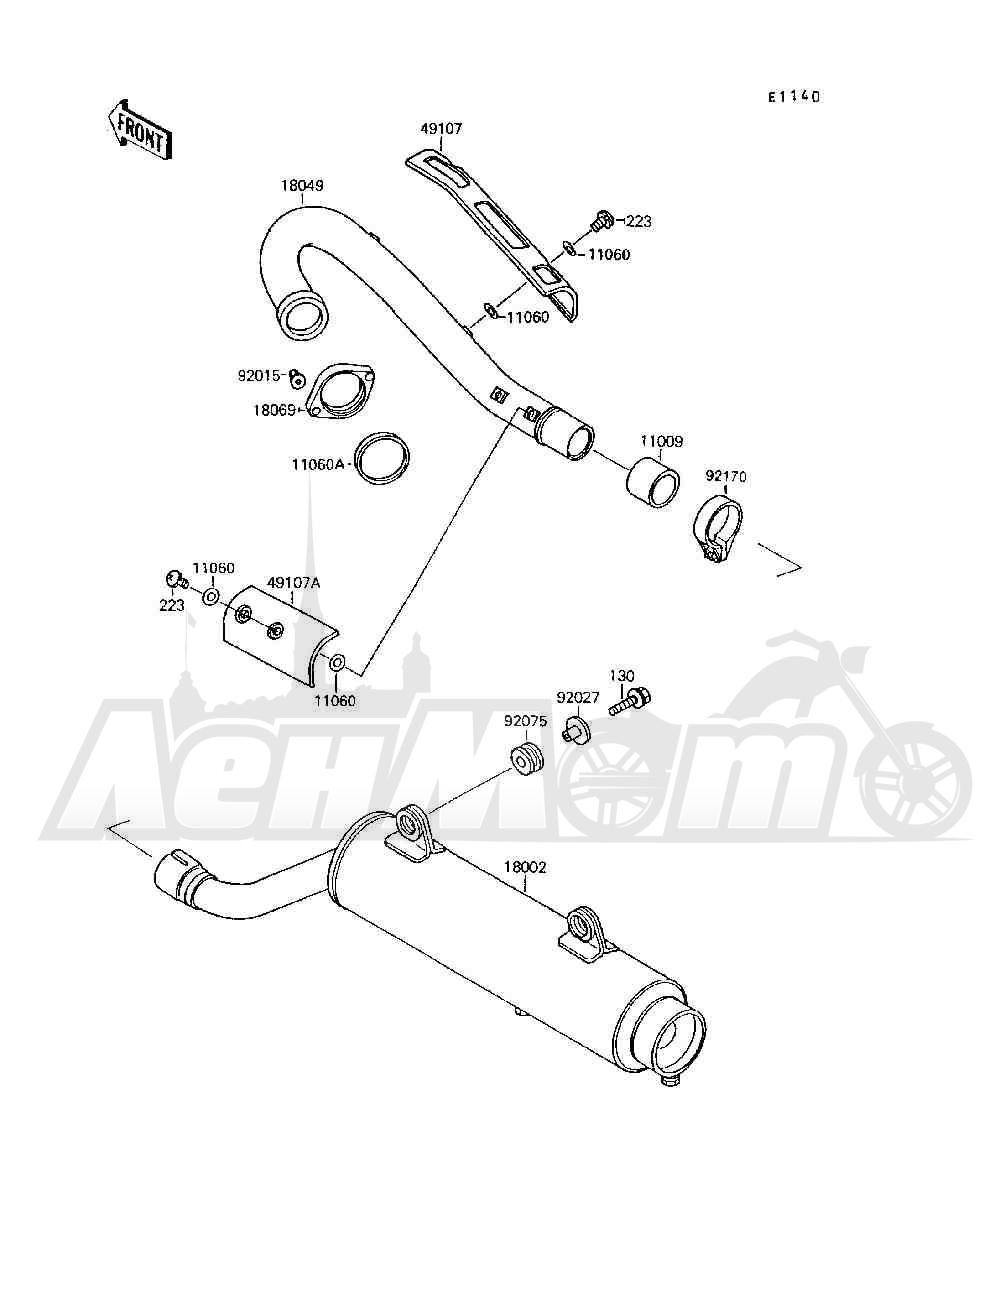 Запчасти для Квадроцикла Kawasaki 1994 MOJAVE 250 (KSF250-A8) Раздел: MUFFLER(S) | глушитель (S)